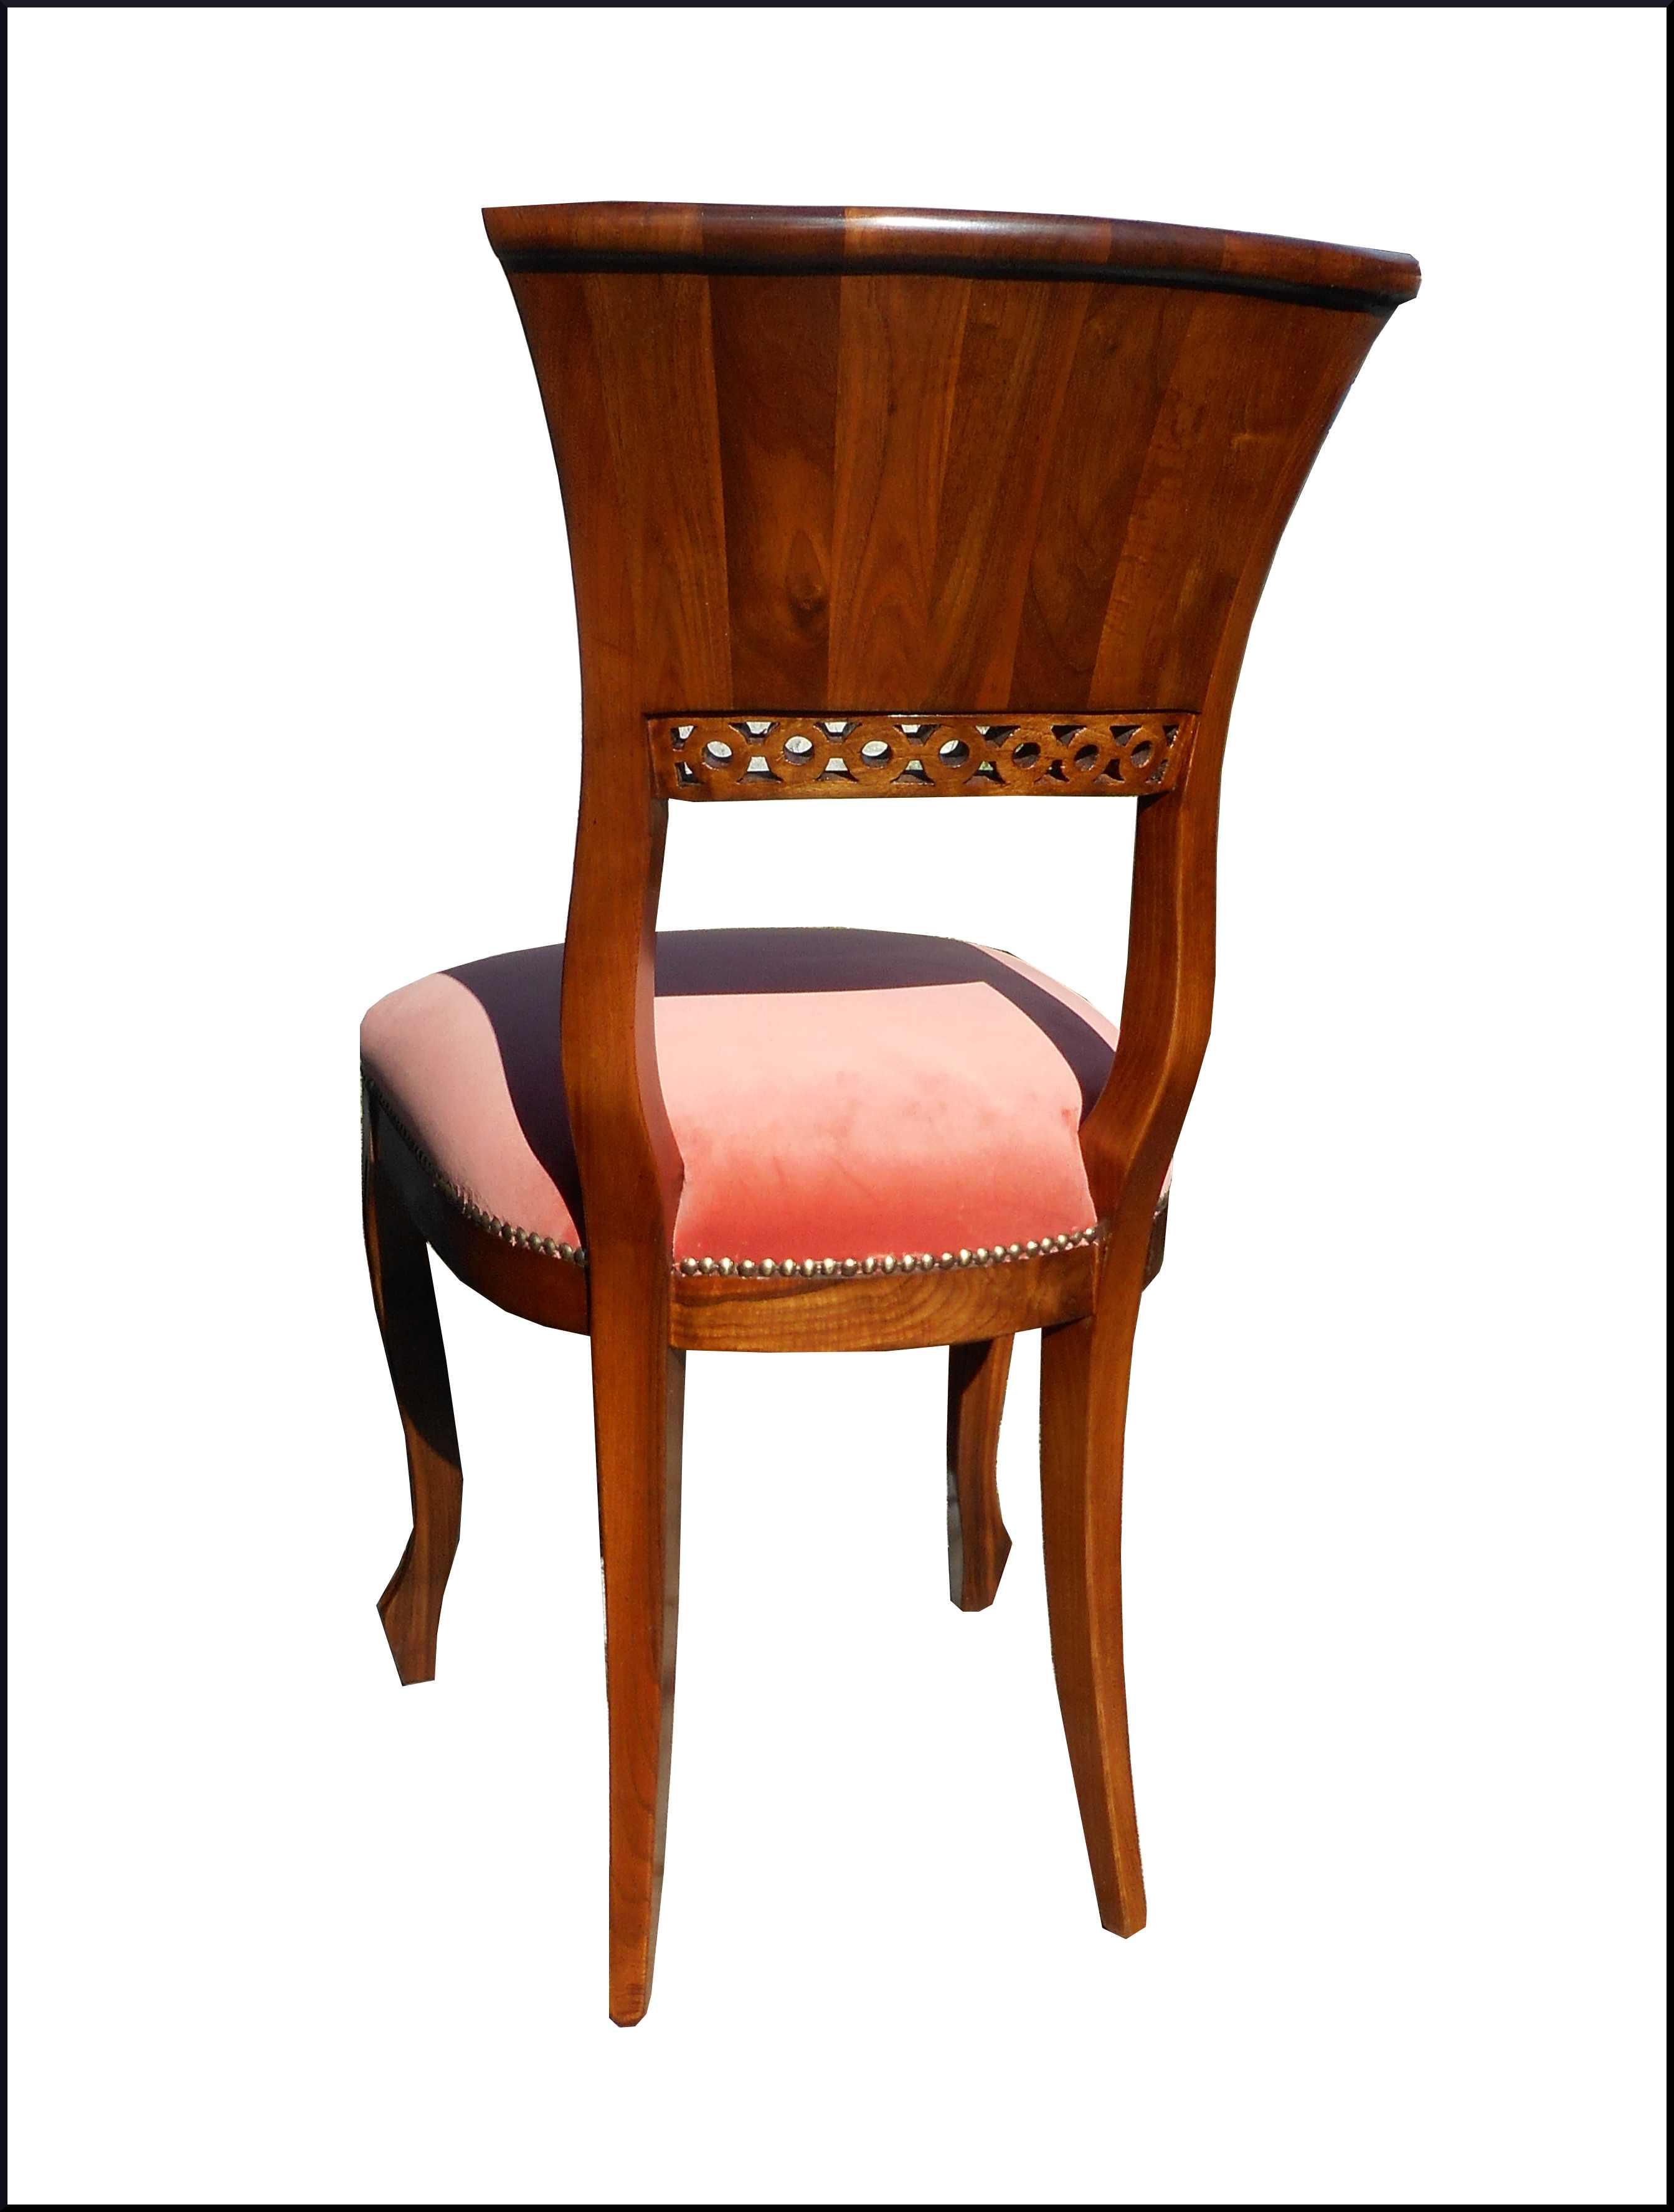 Elegante sedia Luigi Filippo intagliata